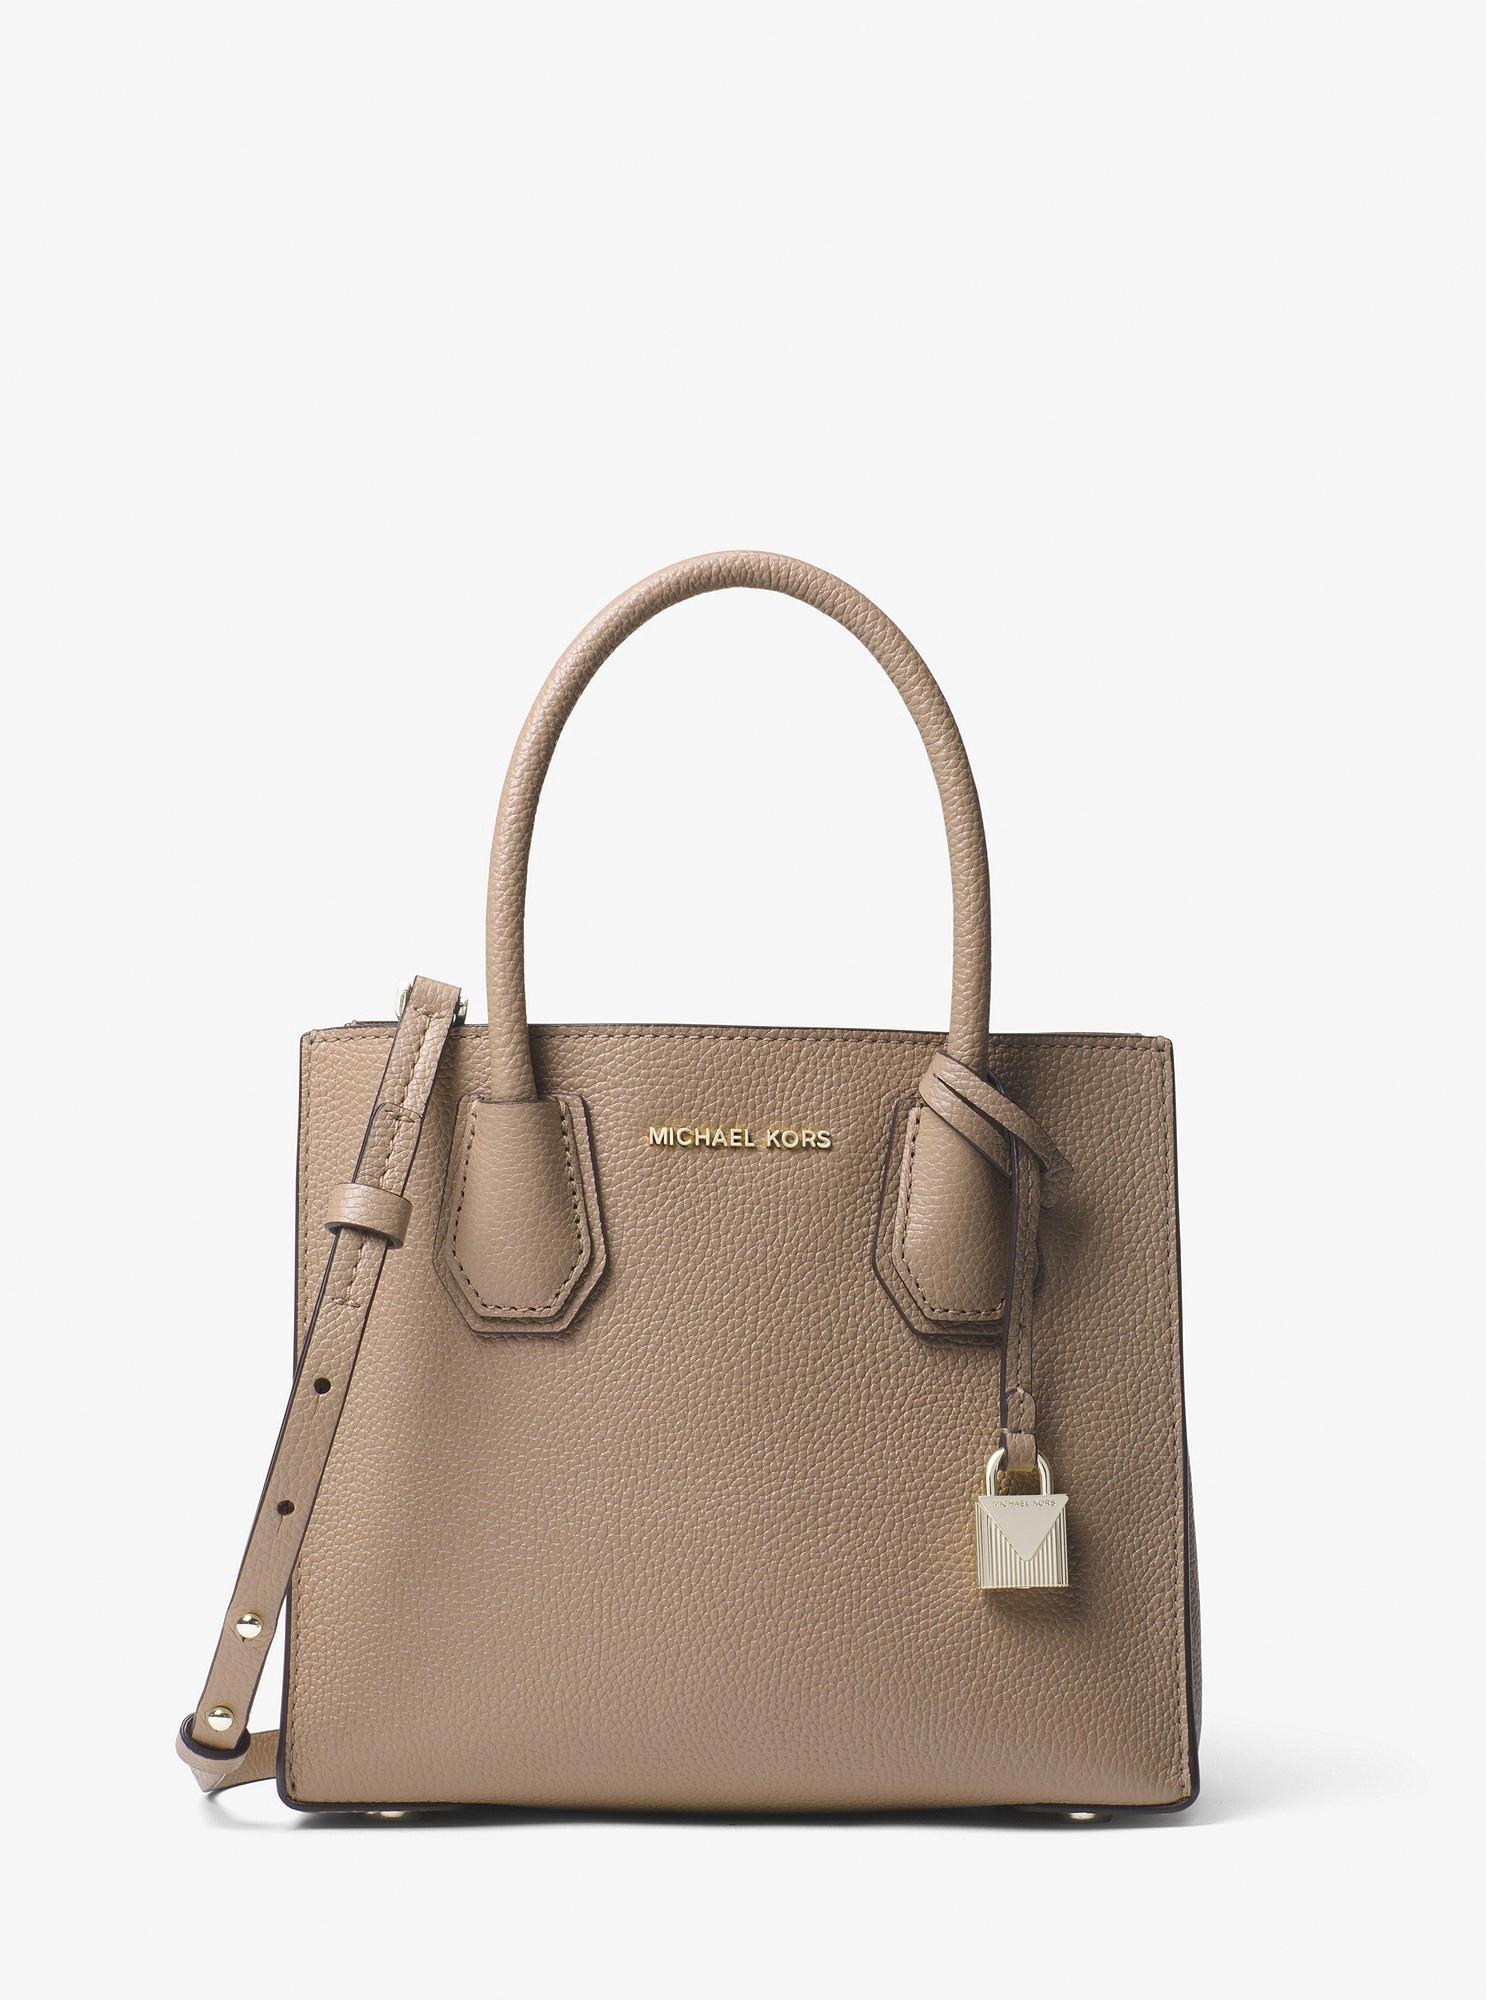 7dcace917a8f Michael Kors Mercer Leather Crossbody - Truffle  Designerhandbags ...